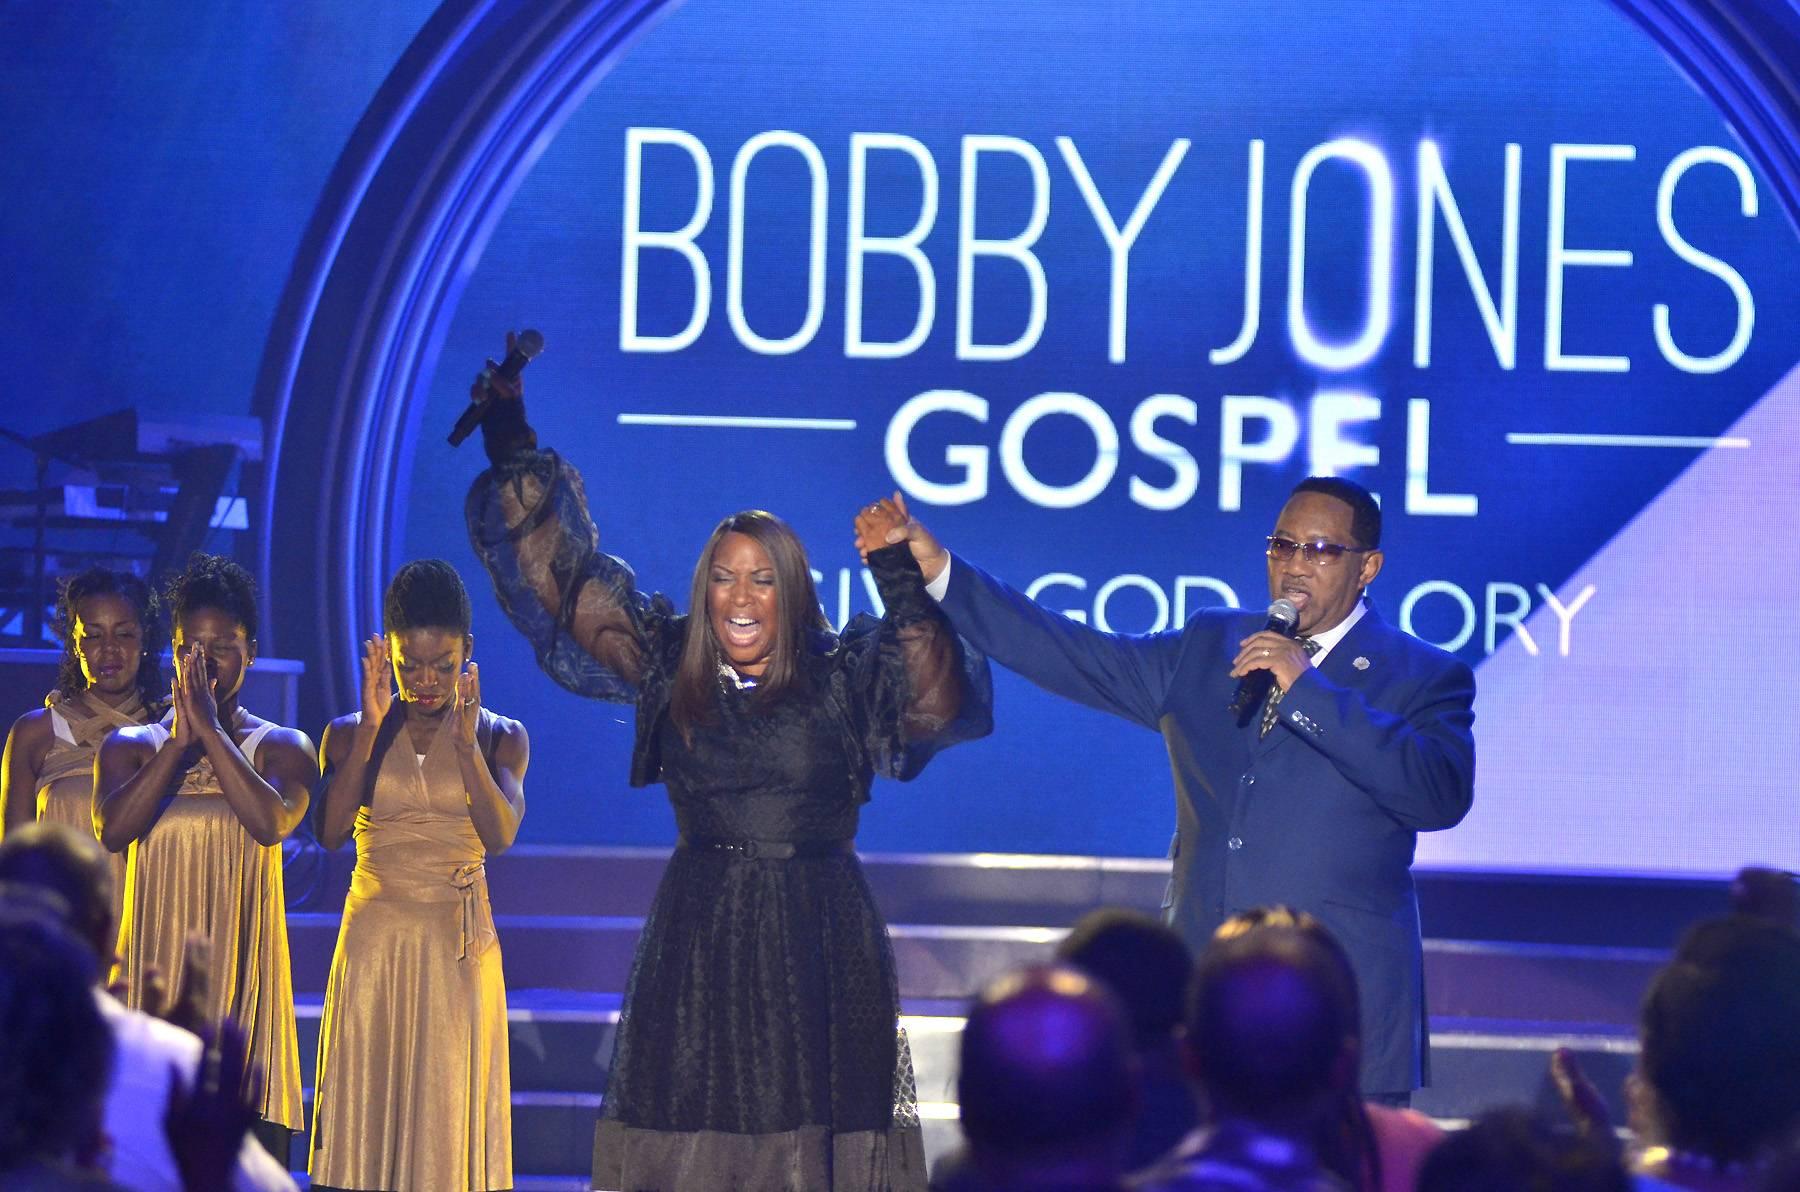 Dr. Bobby Jones and Nancy Jackson Johnson - Bobby Jones speaks with Nancy Jackson Johnson during the taping of BET's Bobby Jones Gospel at BET Studios on August 3, 2014, in Washington, D.C.(Photo: Kris Connor/Getty Images for BET Networks)